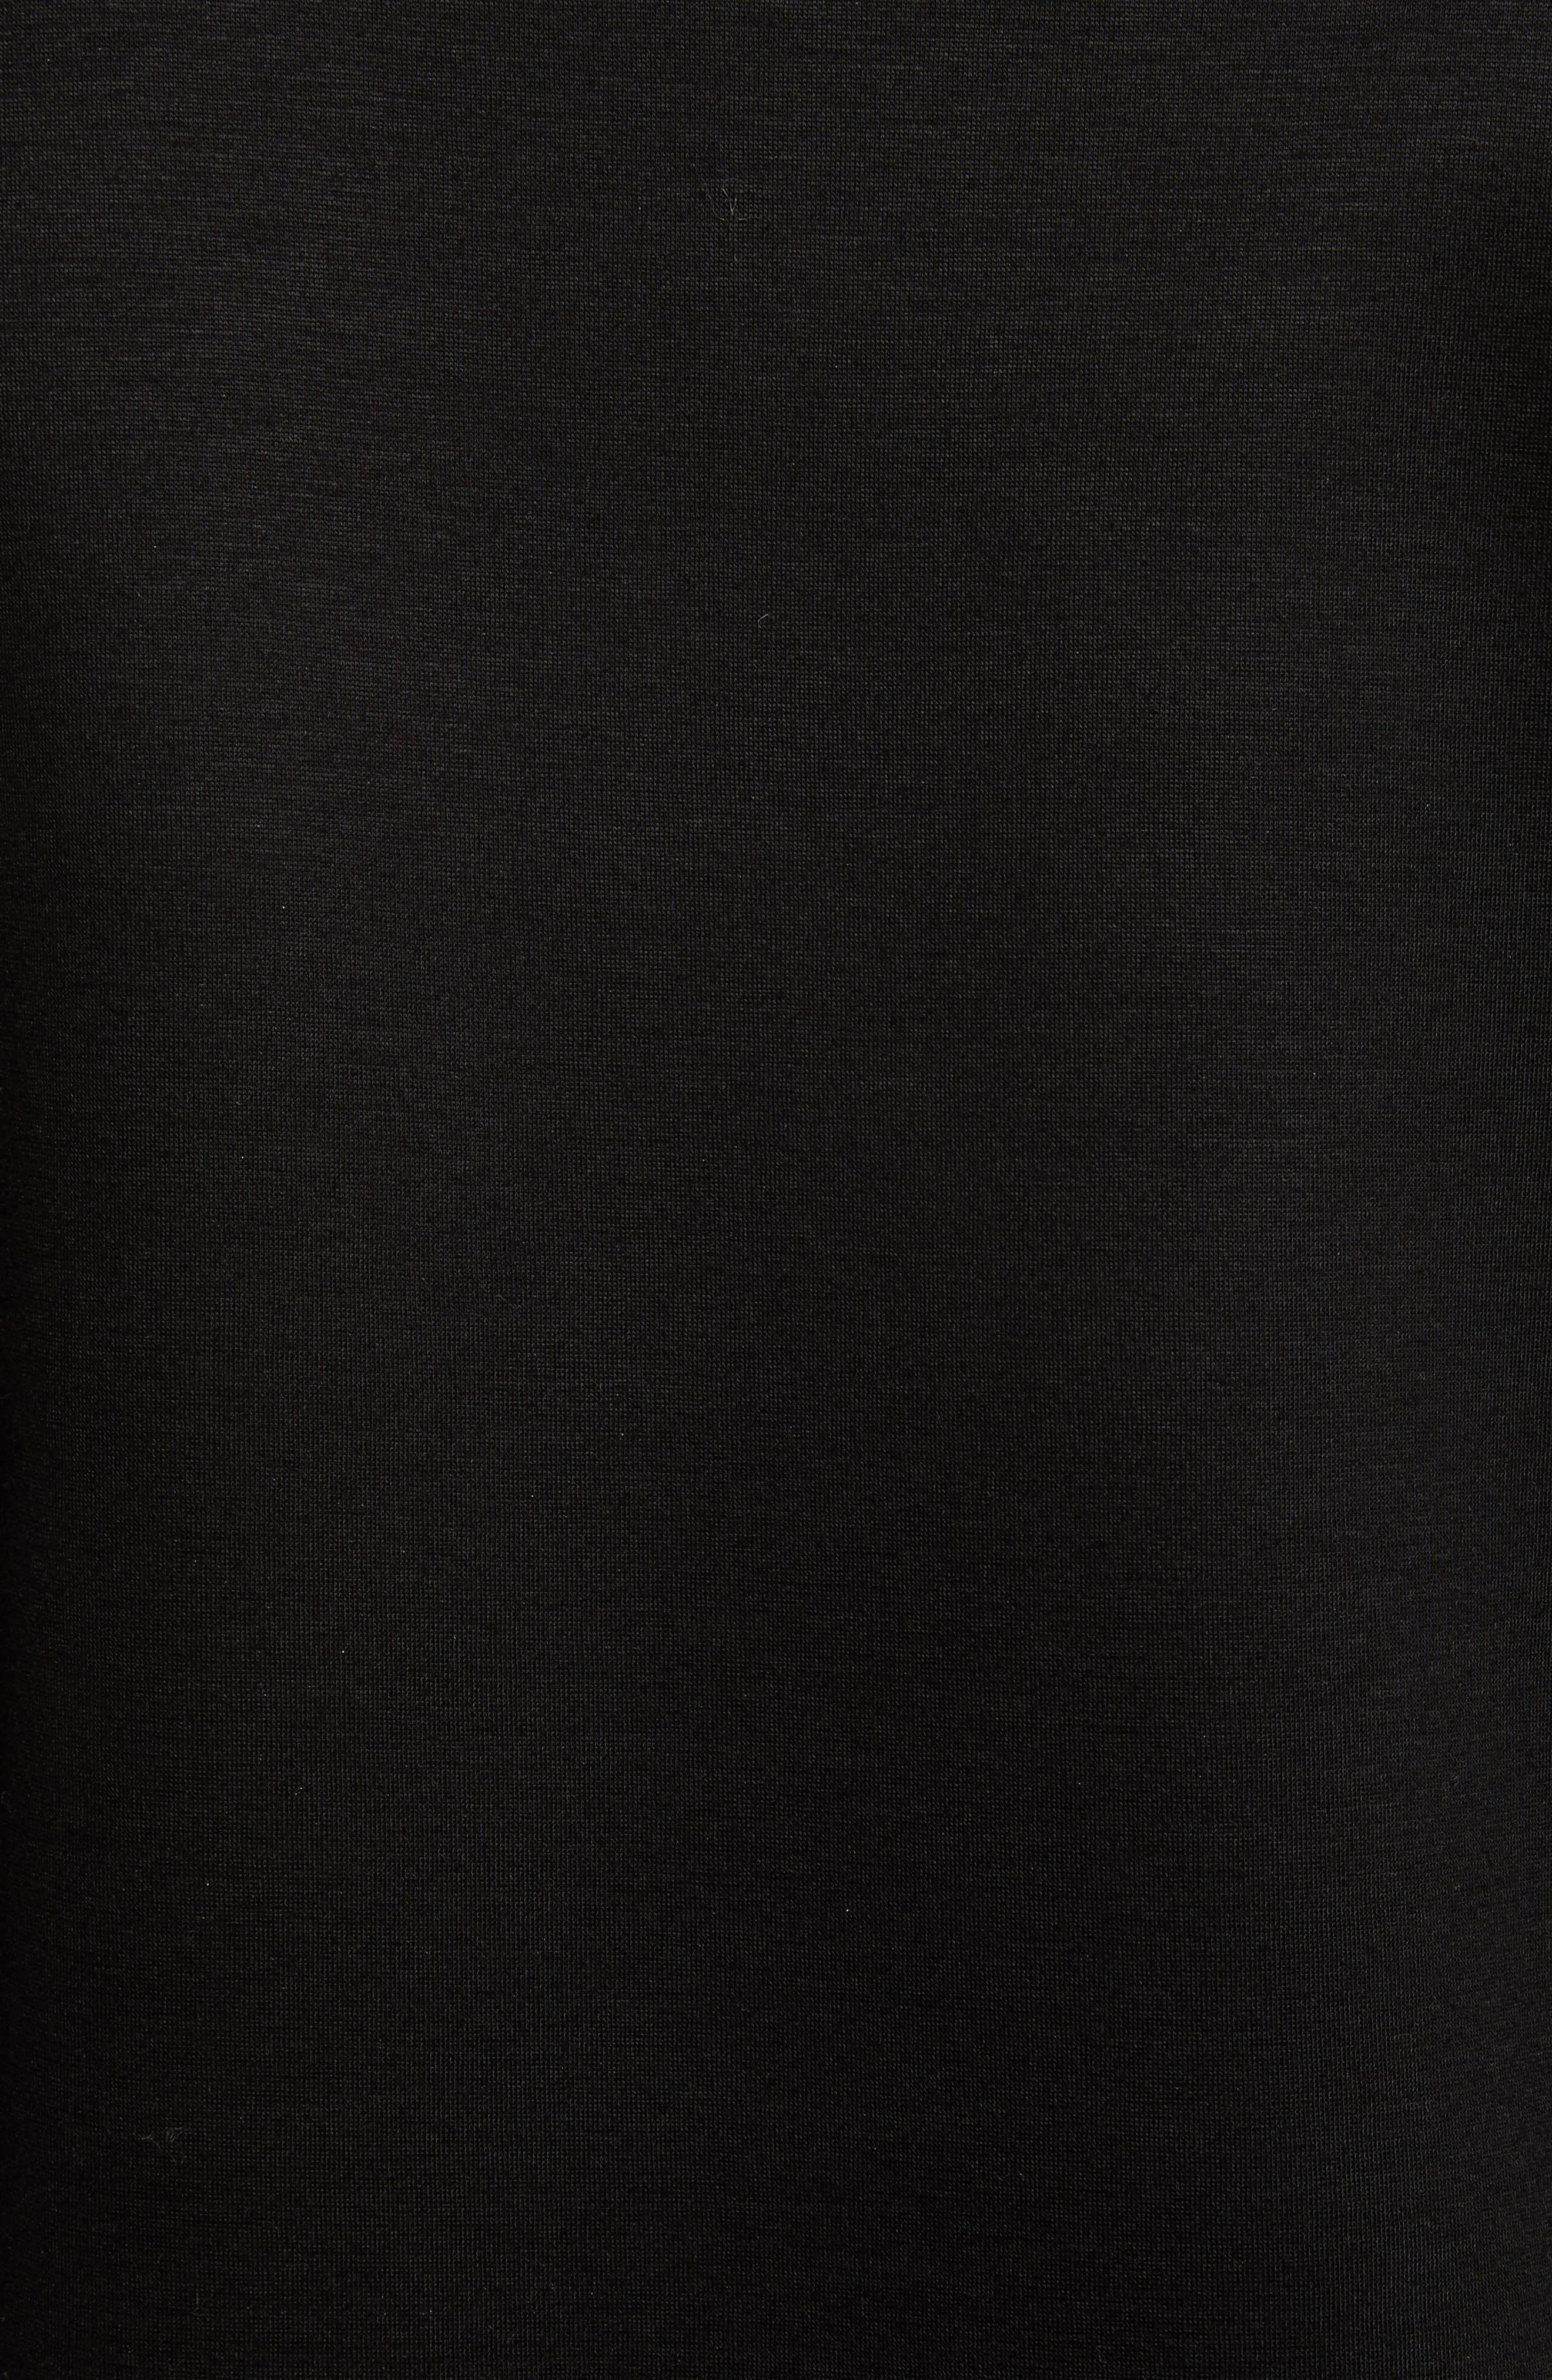 Belsford Crewneck Sweatshirt,                             Alternate thumbnail 5, color,                             Black